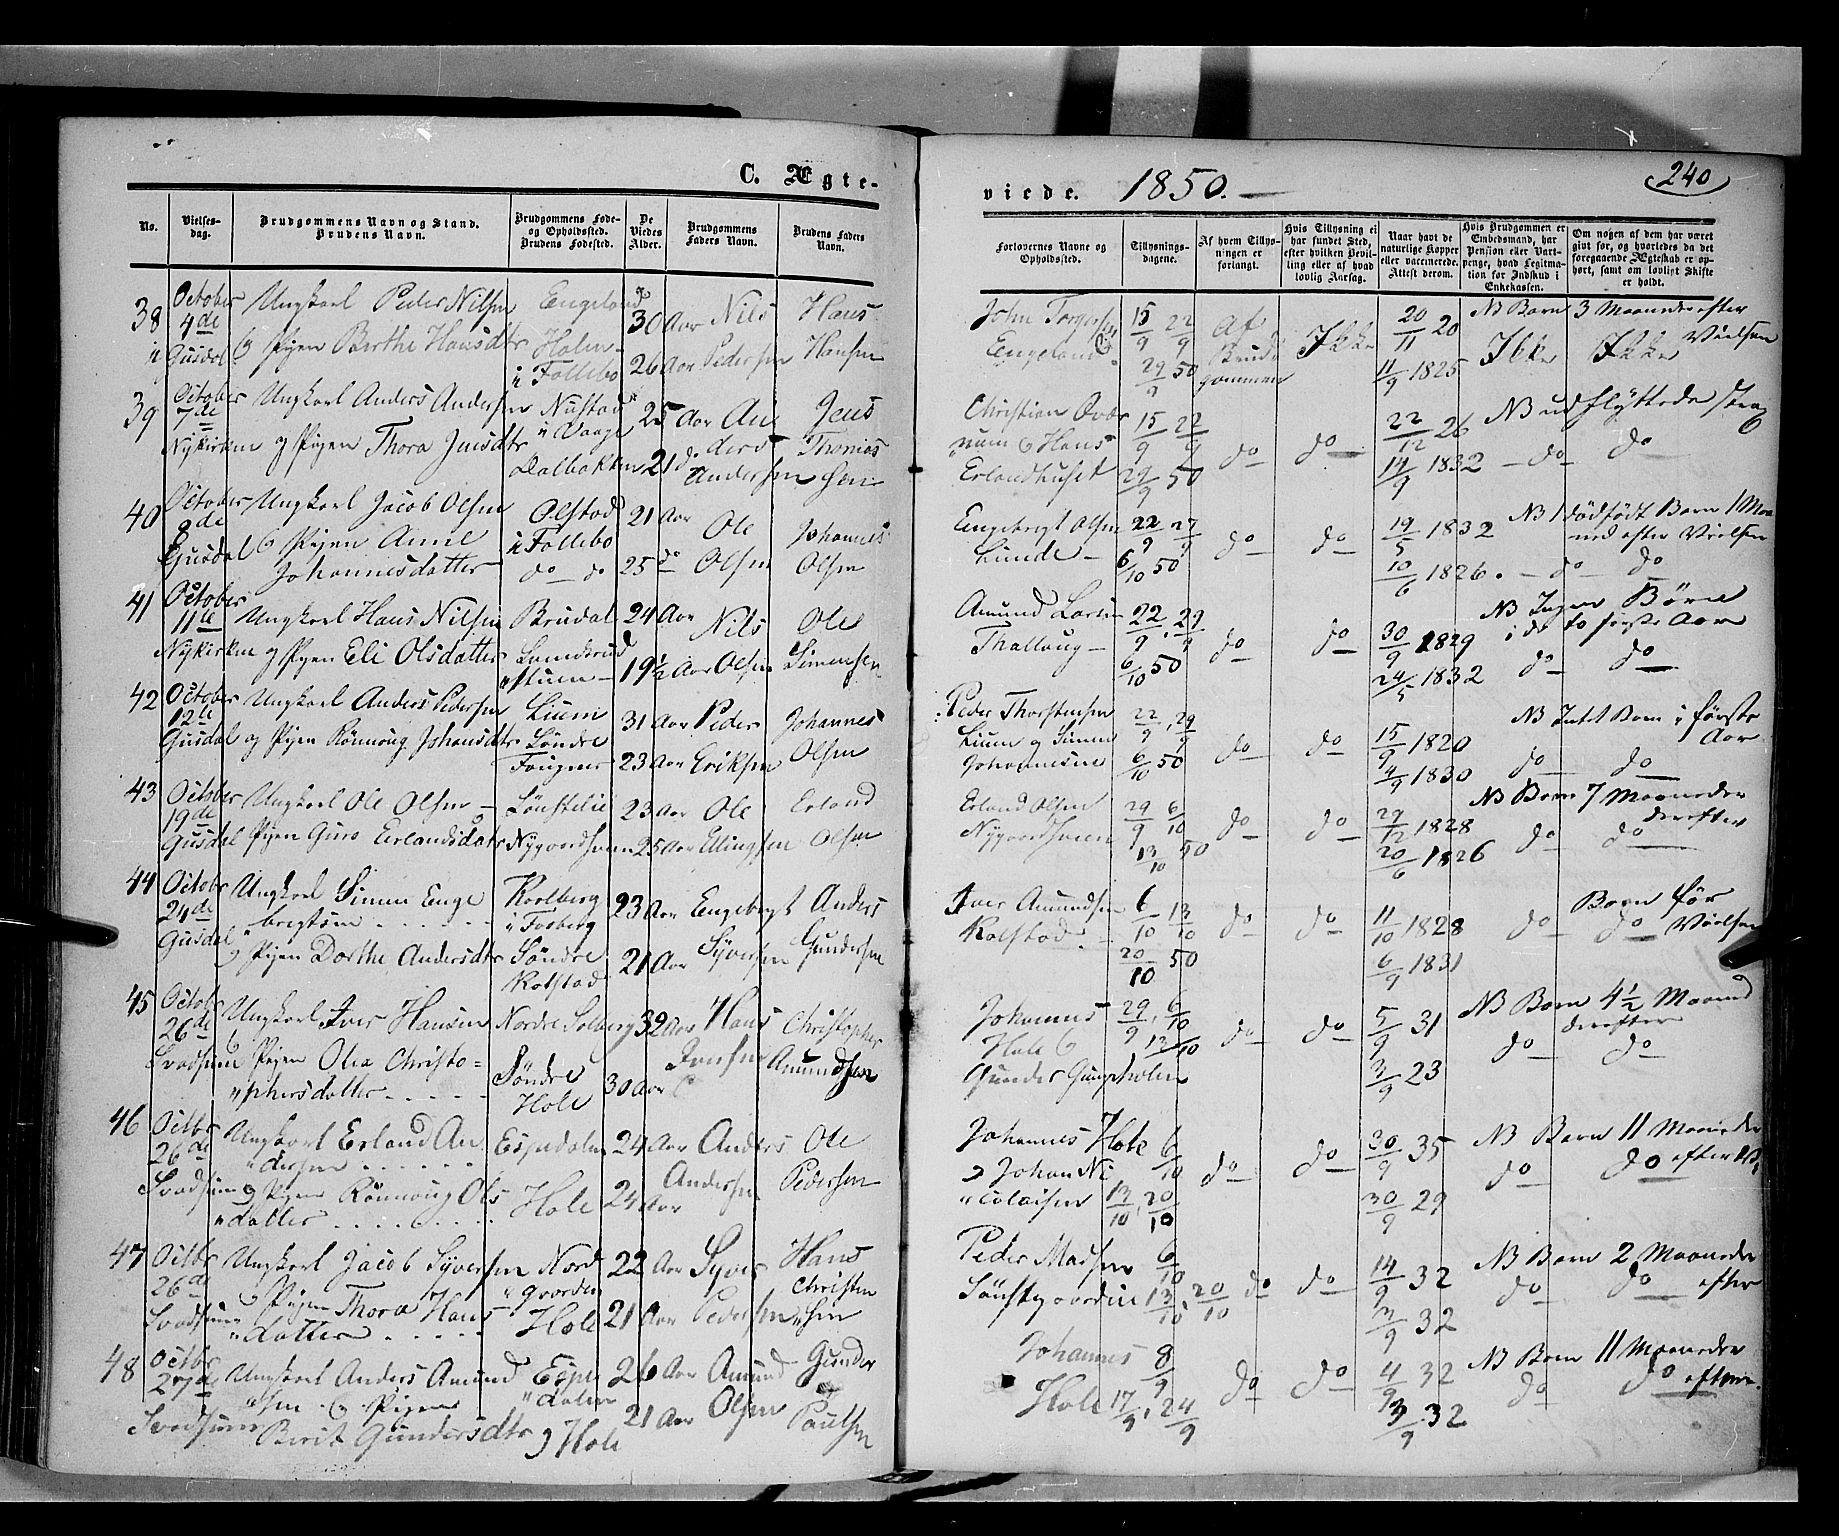 SAH, Gausdal prestekontor, Ministerialbok nr. 8, 1850-1861, s. 240